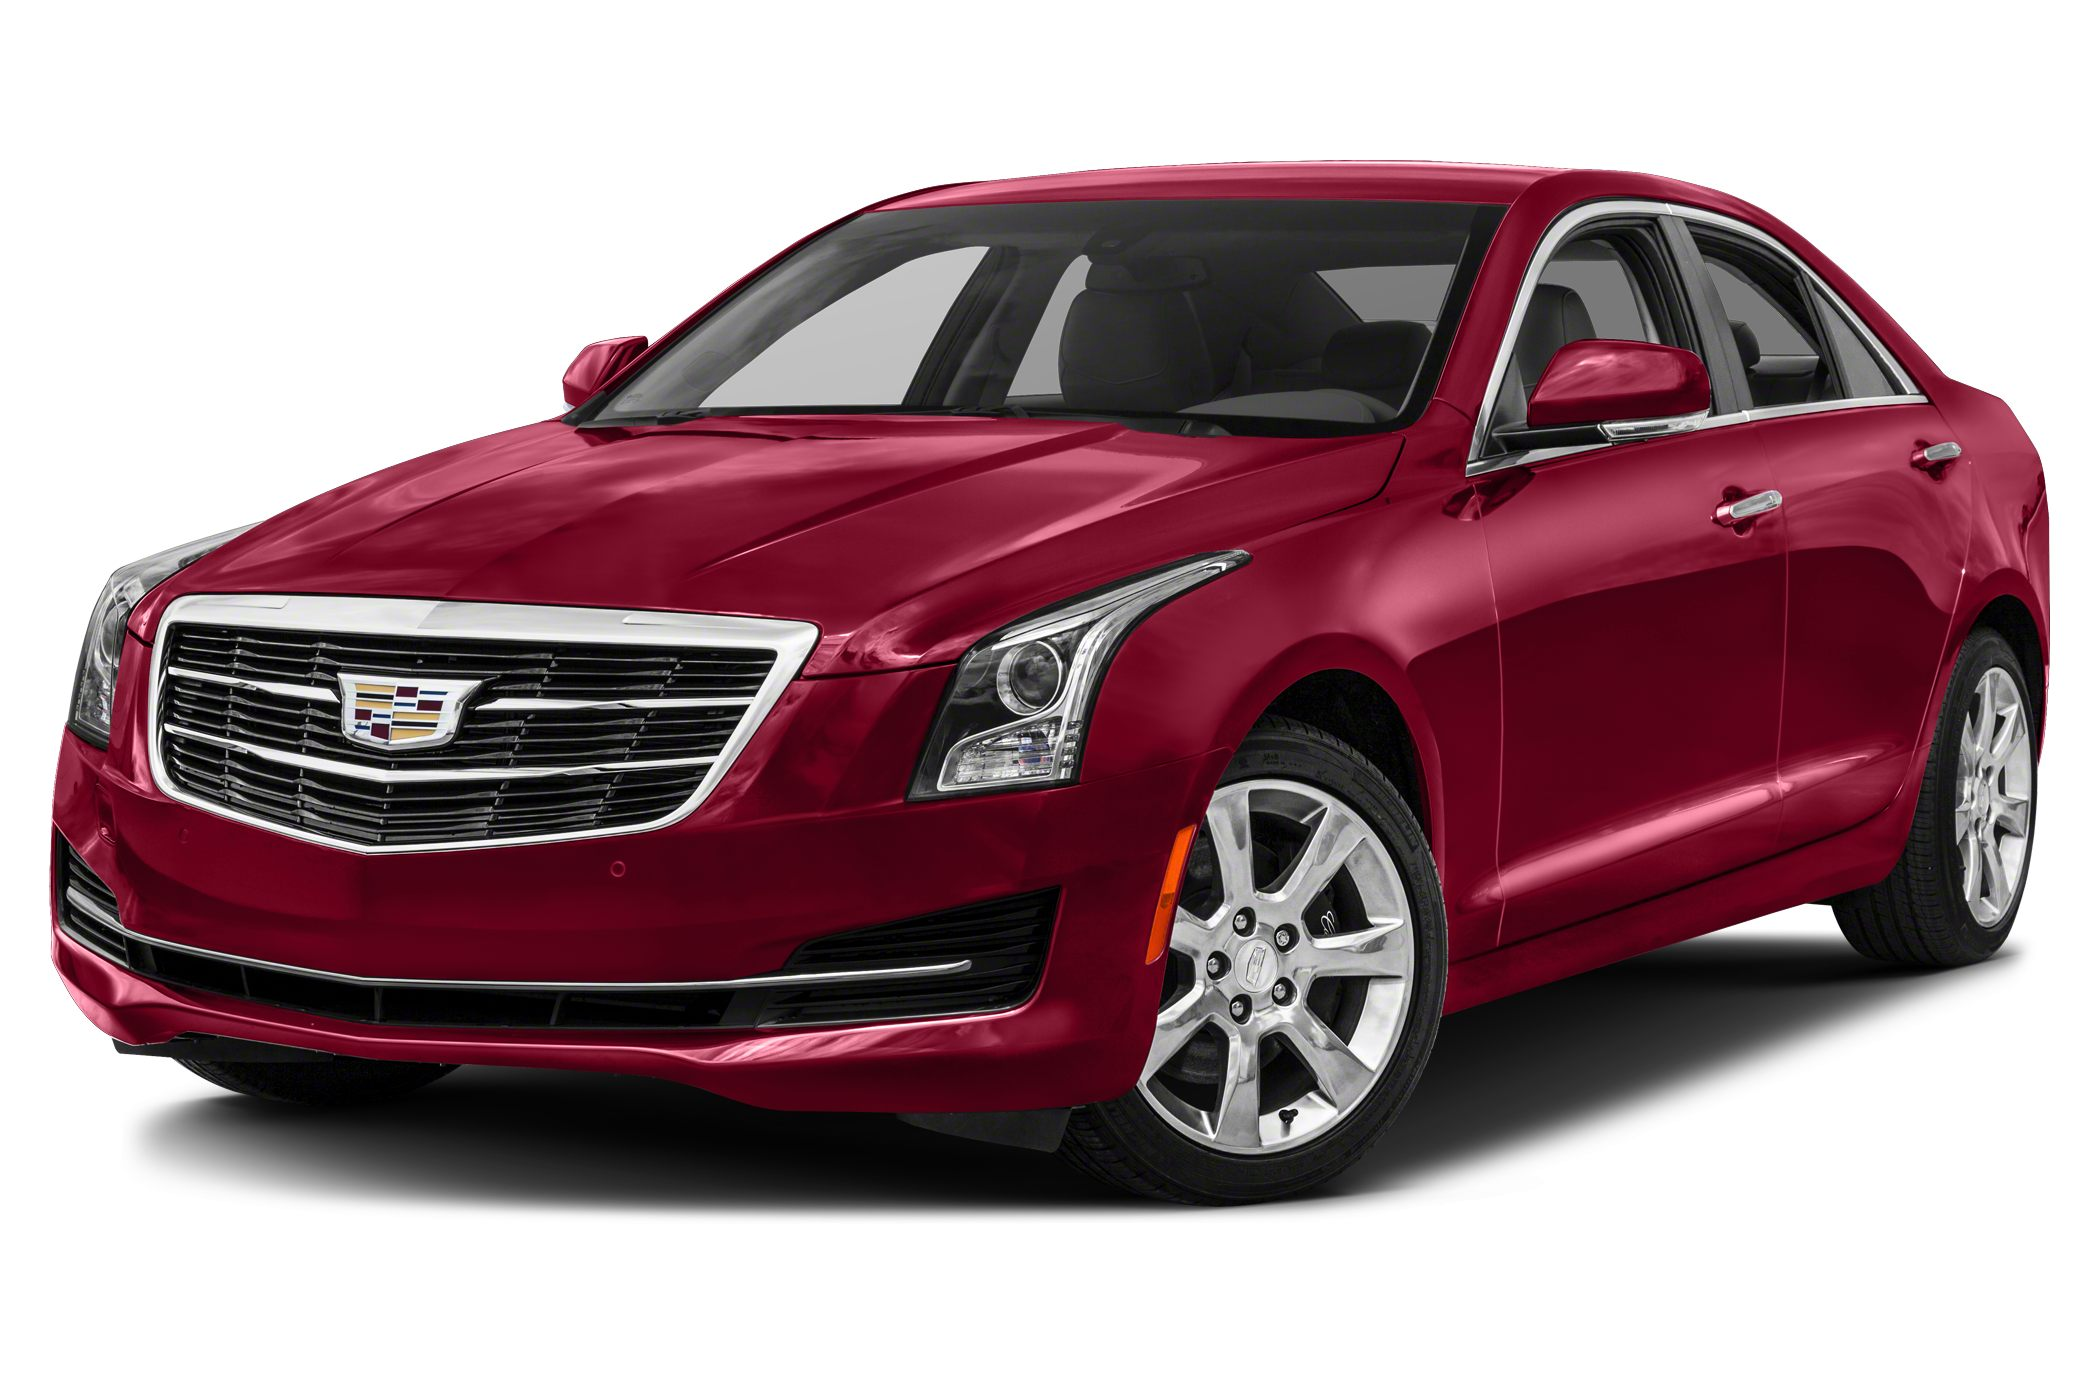 2016 Cadillac Ats 3 6l Luxury